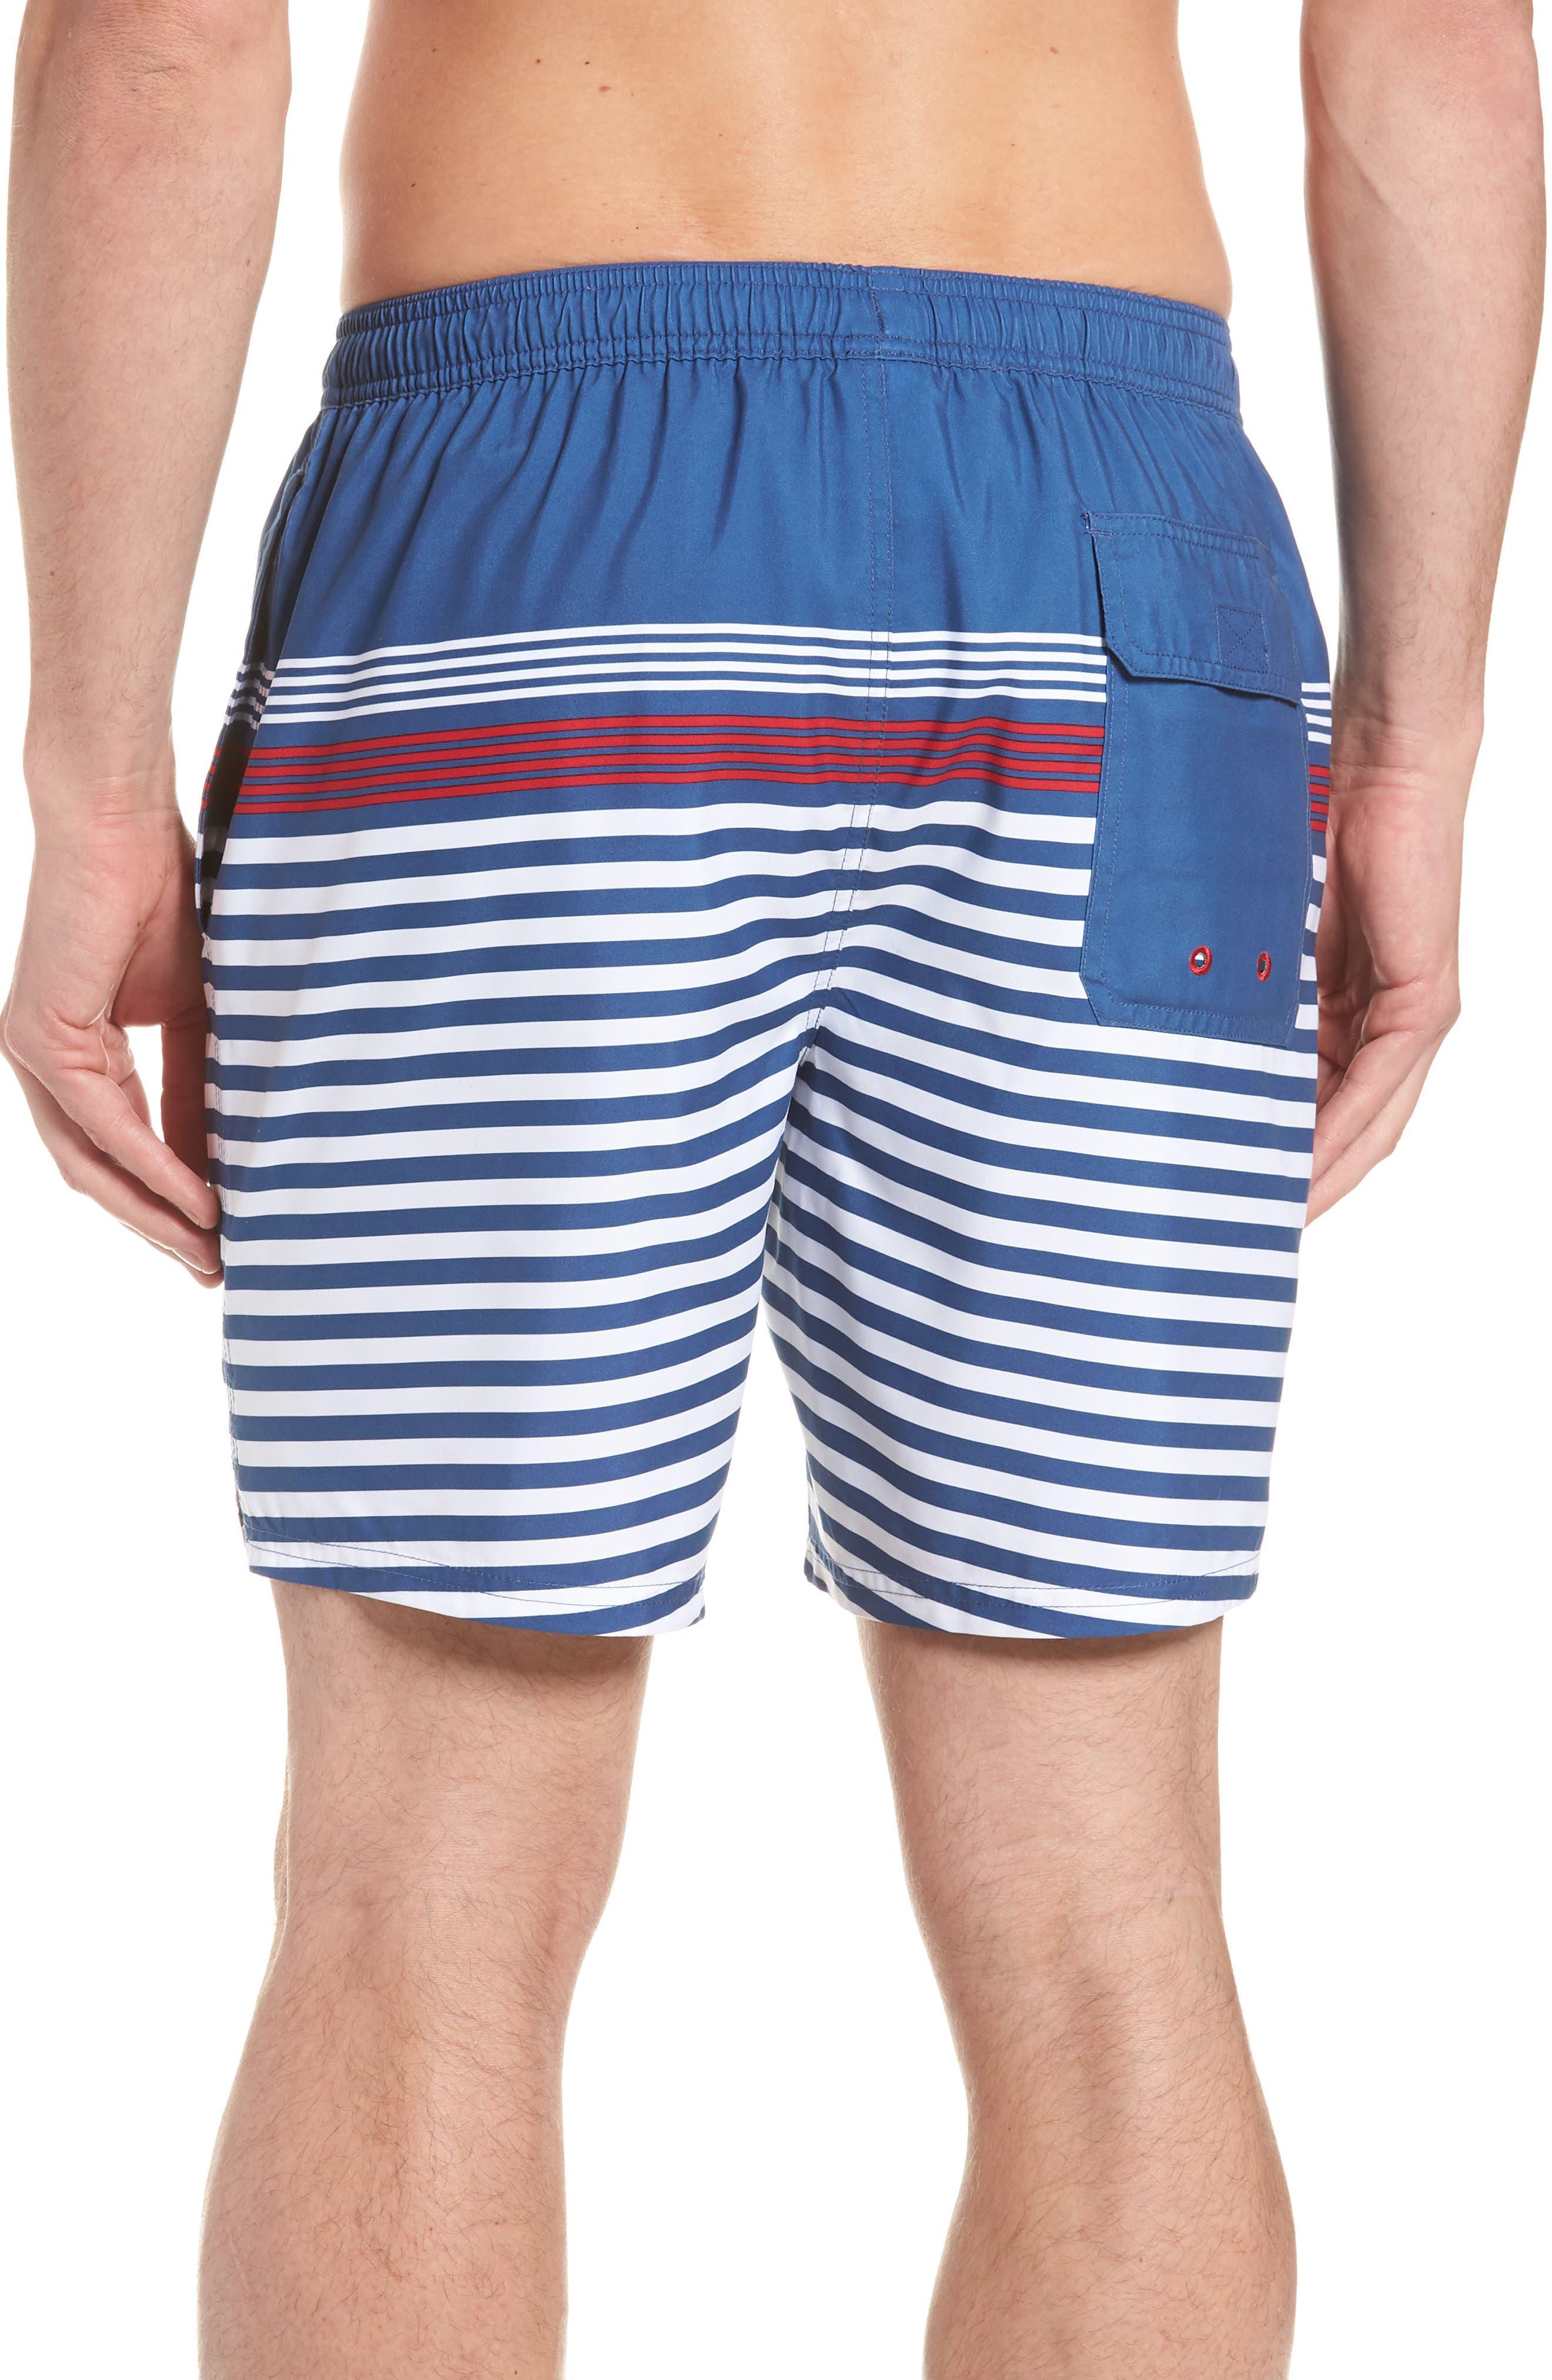 Chappy Summerall Stripe Swim Trunks,                             Alternate thumbnail 2, color,                             MOONSHINE